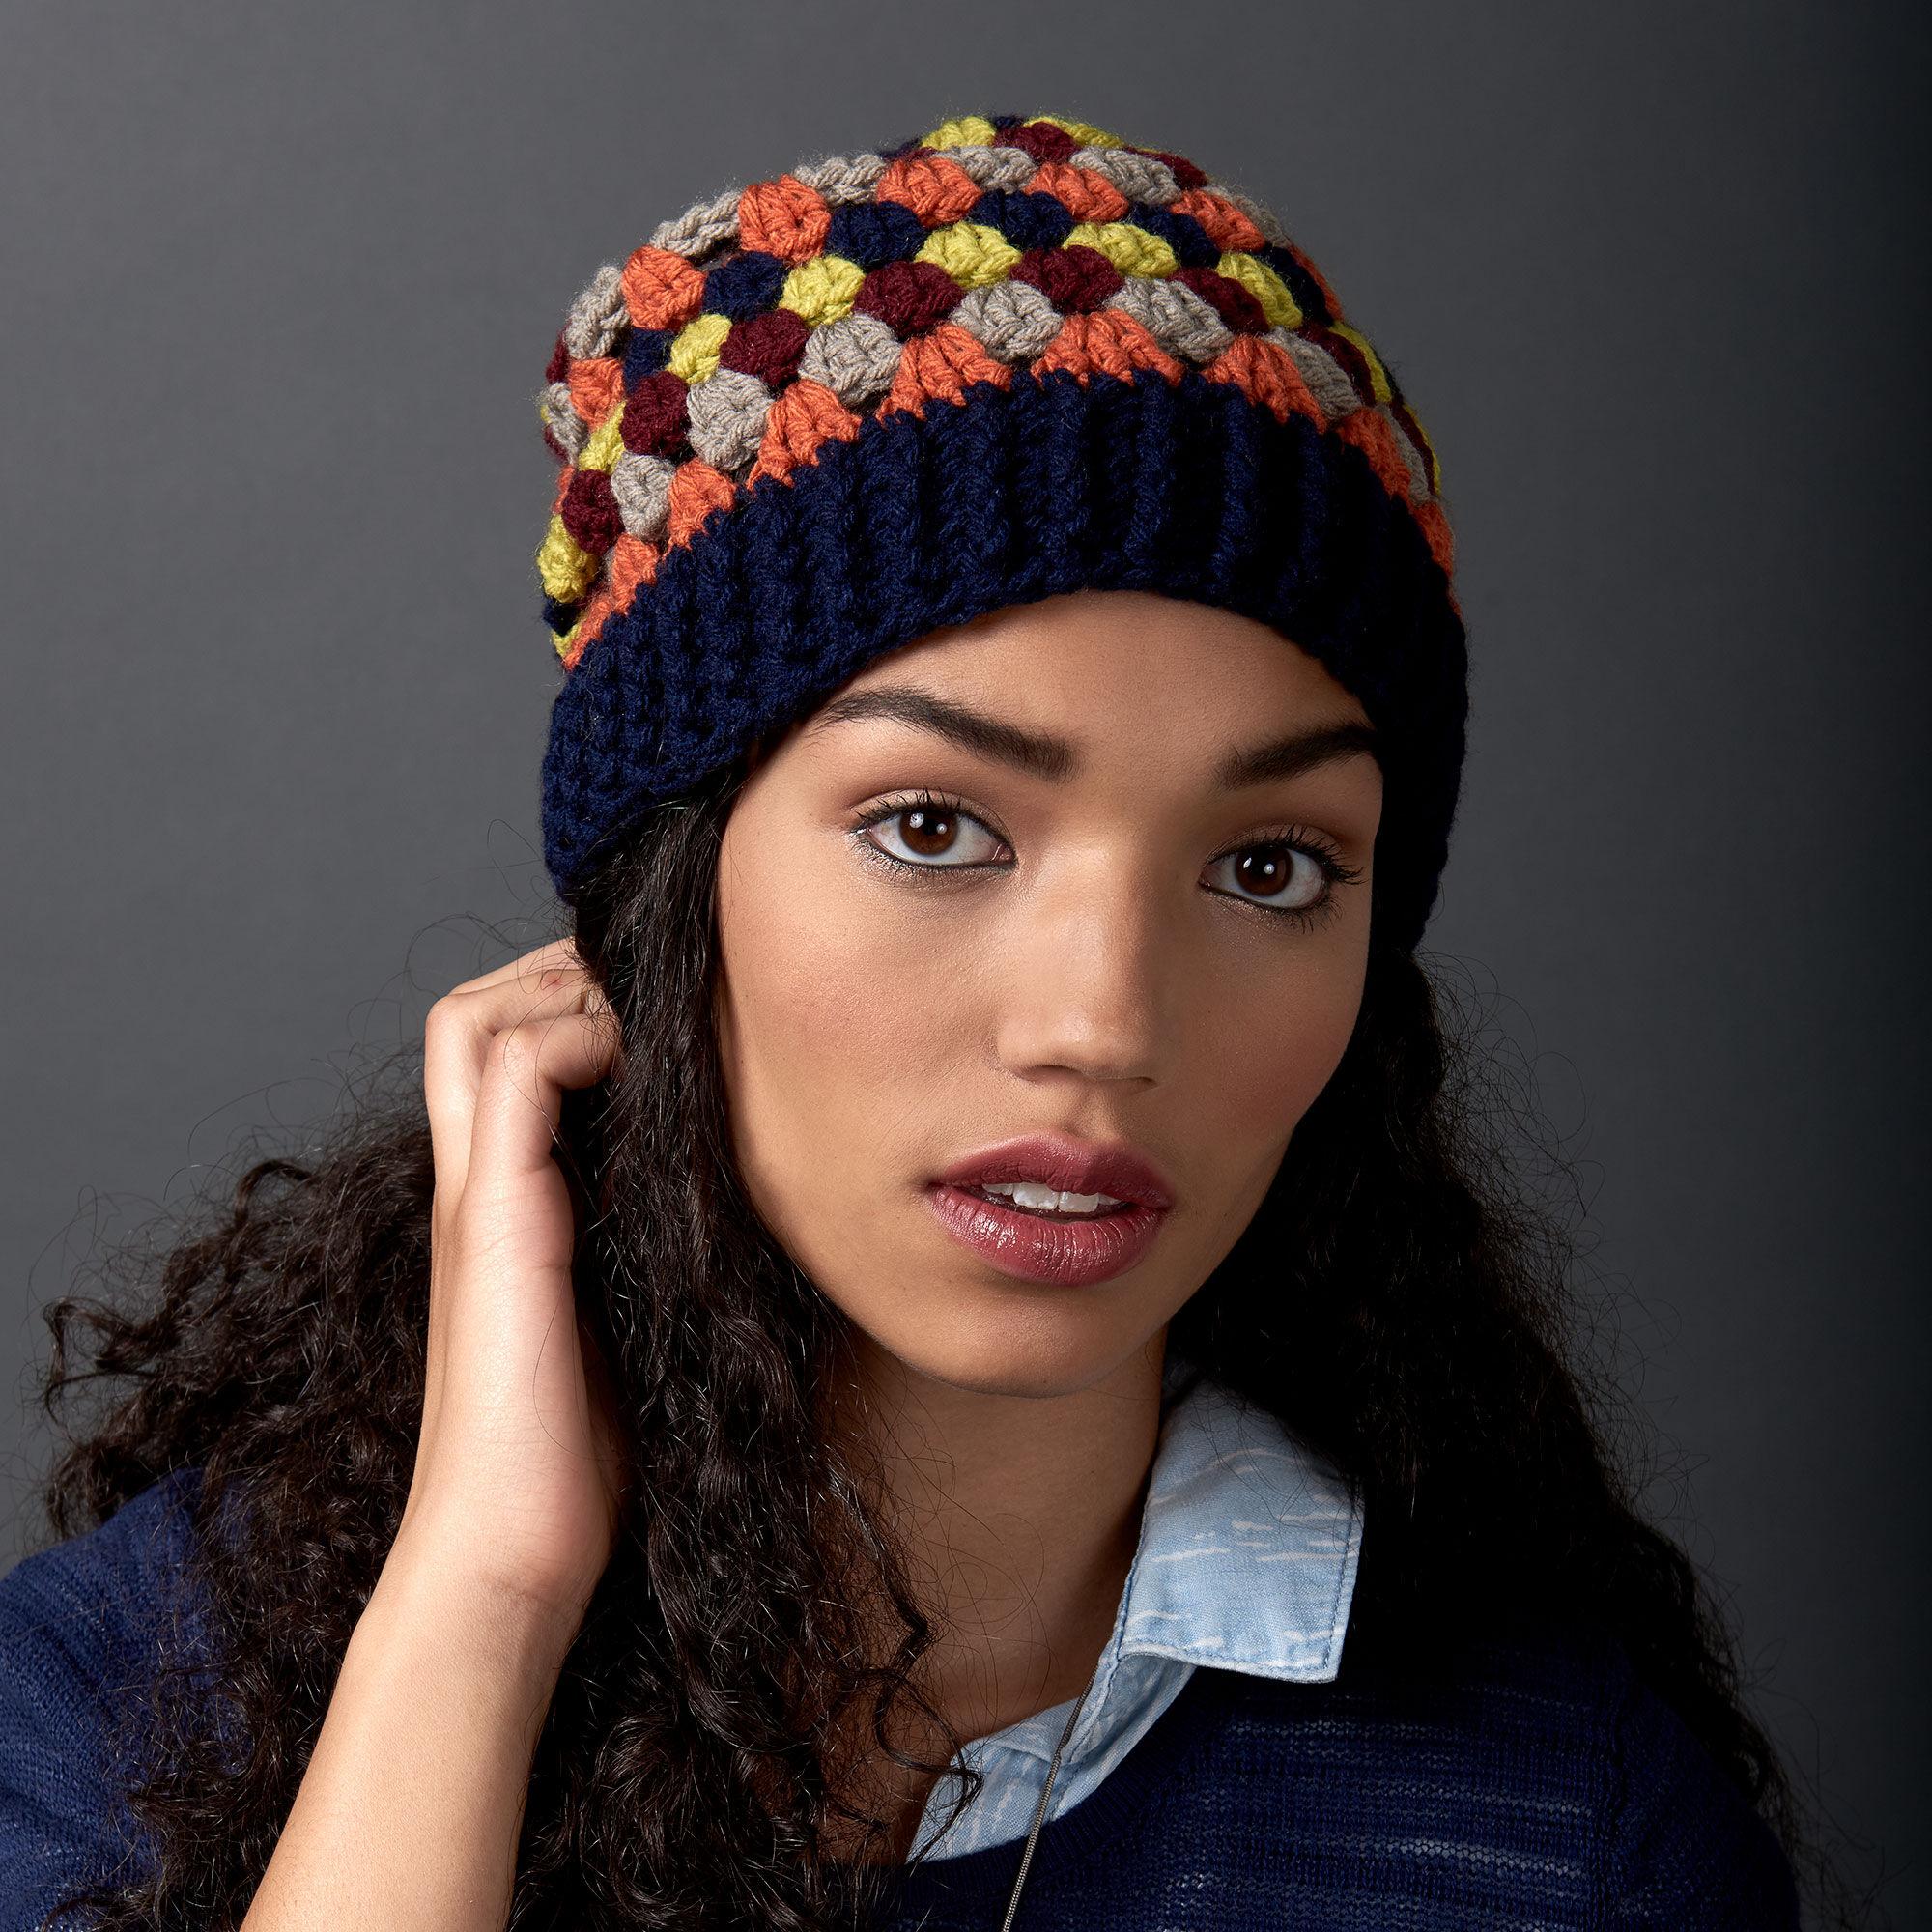 Bernat Granny Stripes Hat · Bernat Granny Stripes Hat ... cbfcd6eb89b